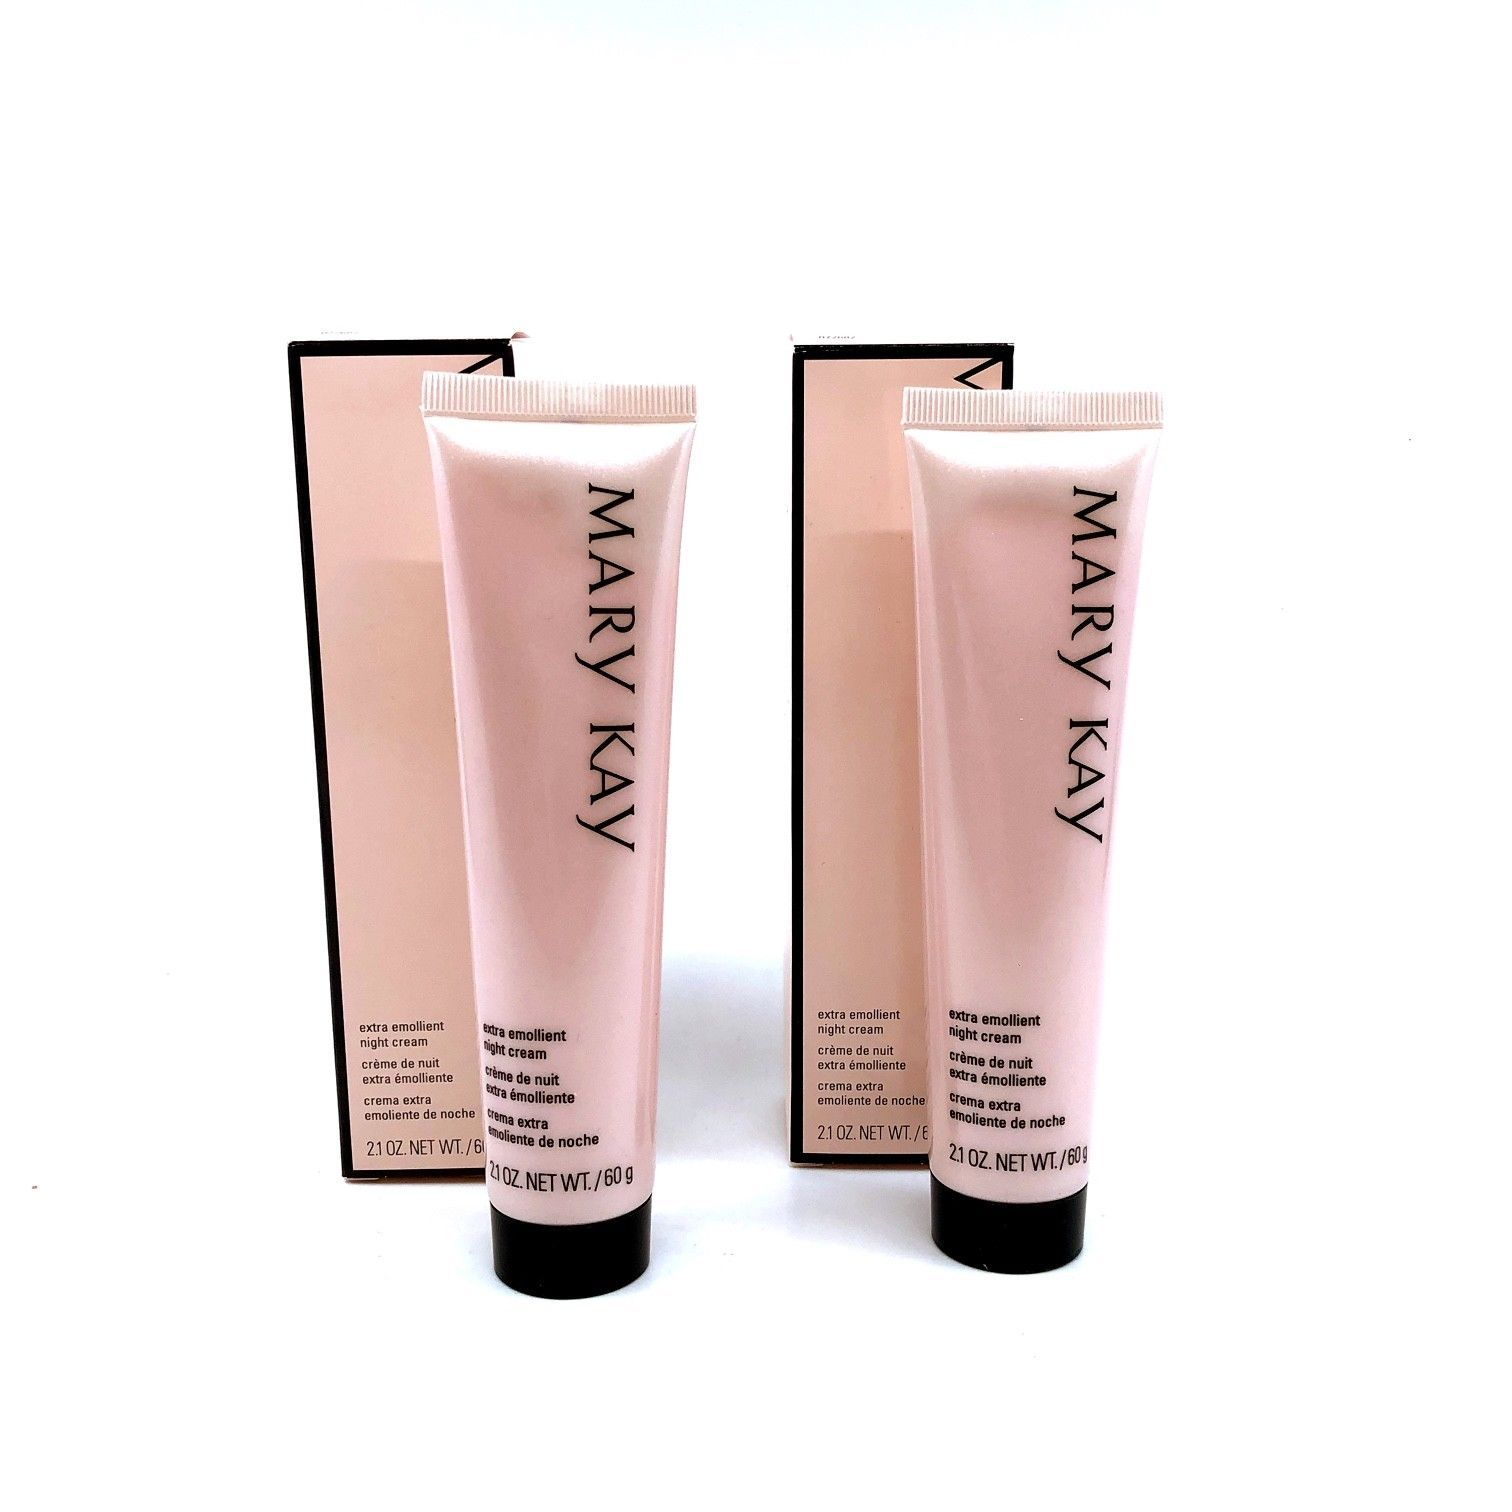 2 PK: MARY KAY Extra Emollient Night Cream, Very Dry Skin ~ Face & Body - 2.1 Oz - $29.97